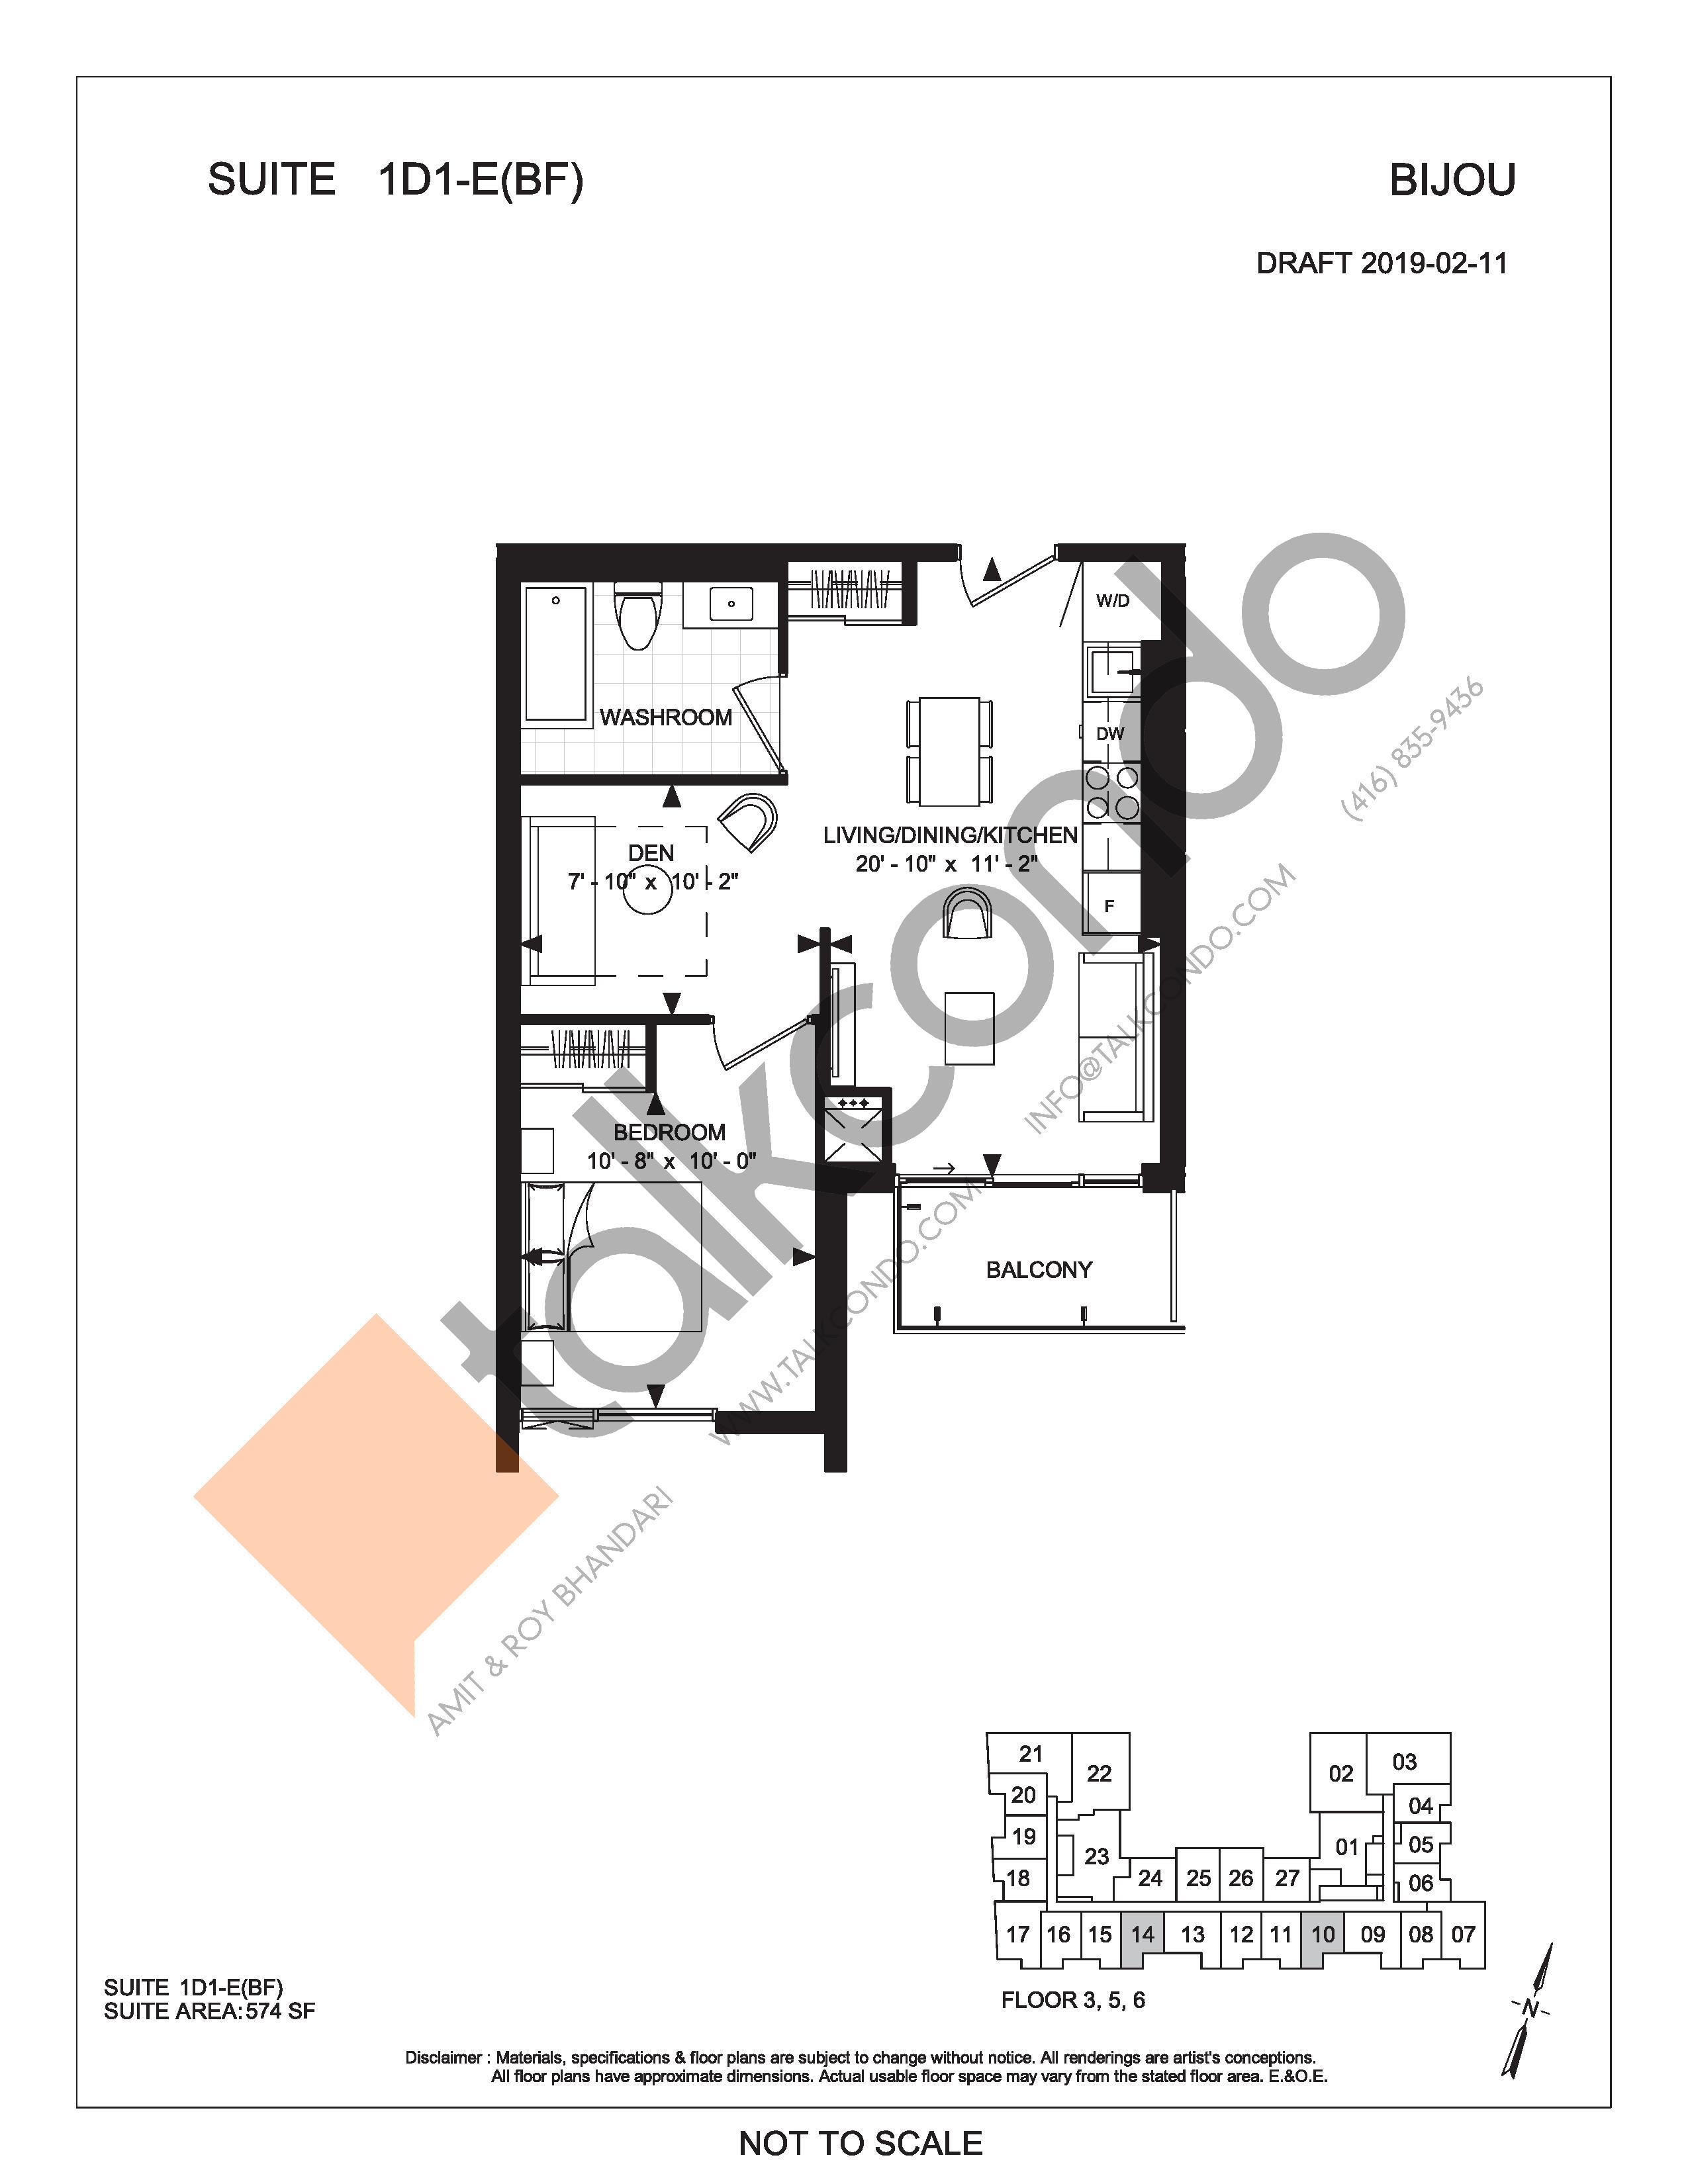 Suite 1D1-E(BF) Floor Plan at Bijou On Bloor Condos - 574 sq.ft